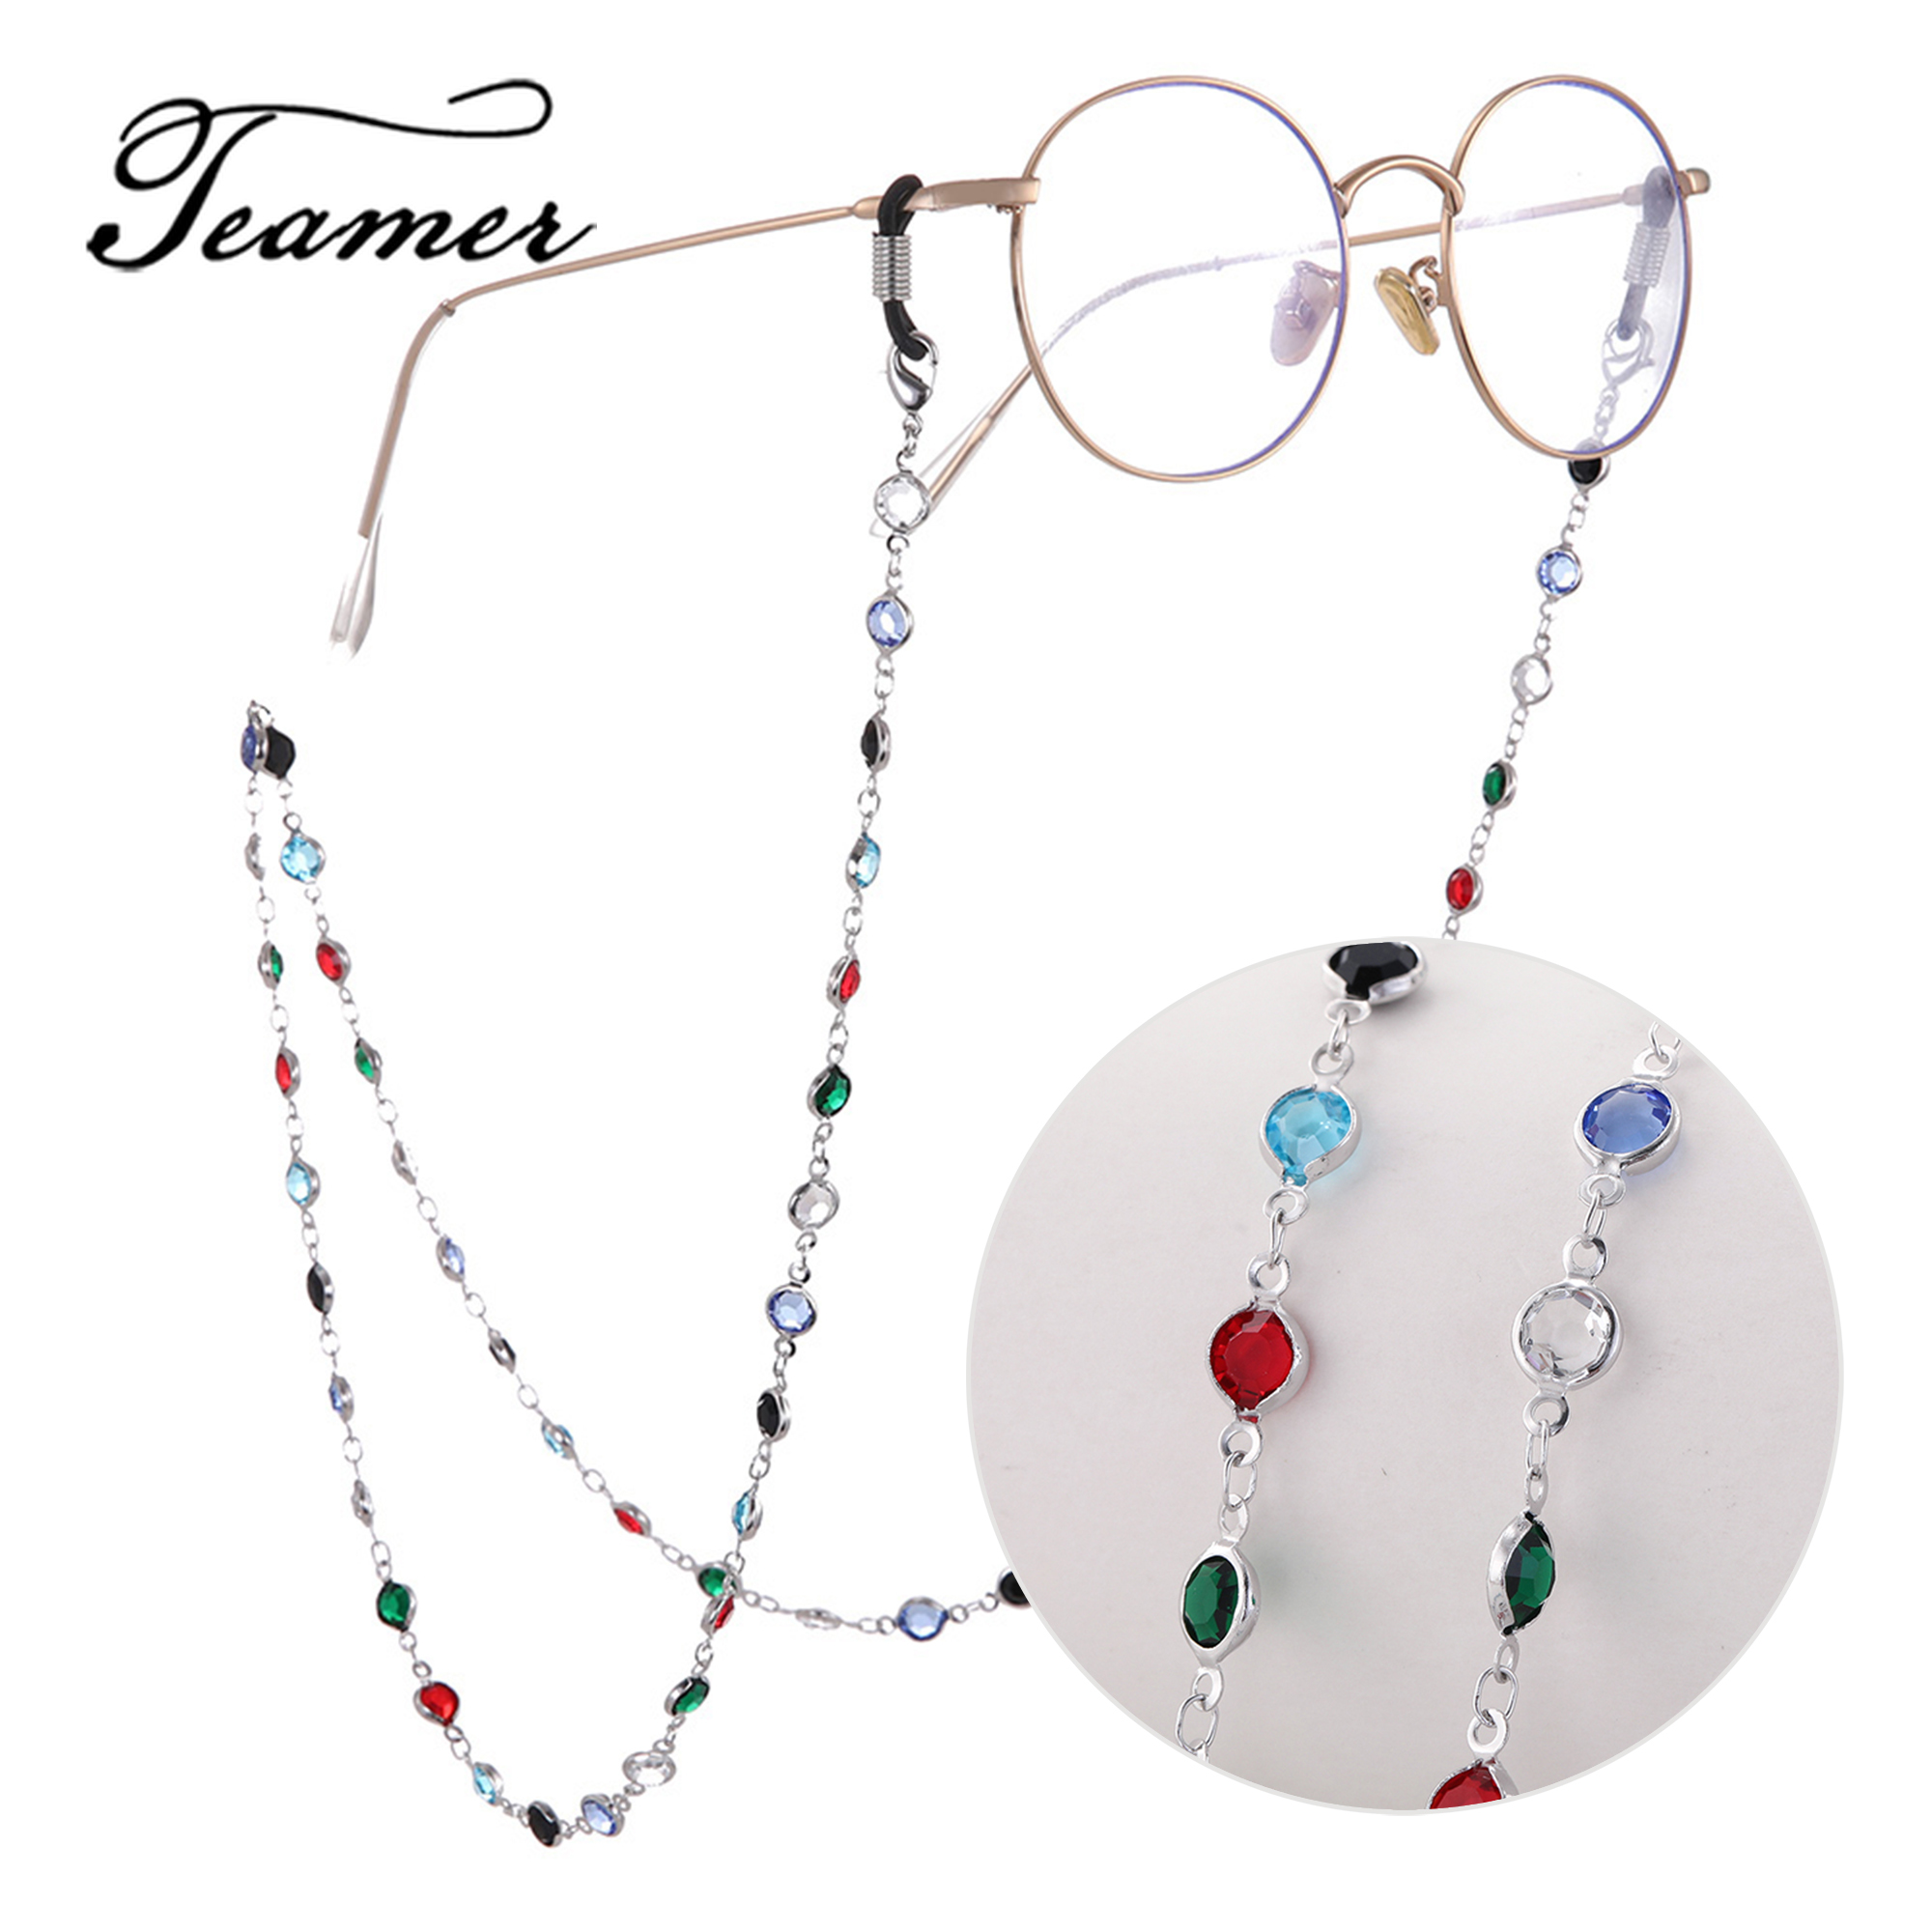 Teamer Colorful Crystal Bead Eyeglass Holder Fashion Glasses Chain Women Eye Accessories Eyewear Straps Cord Sunglasses String